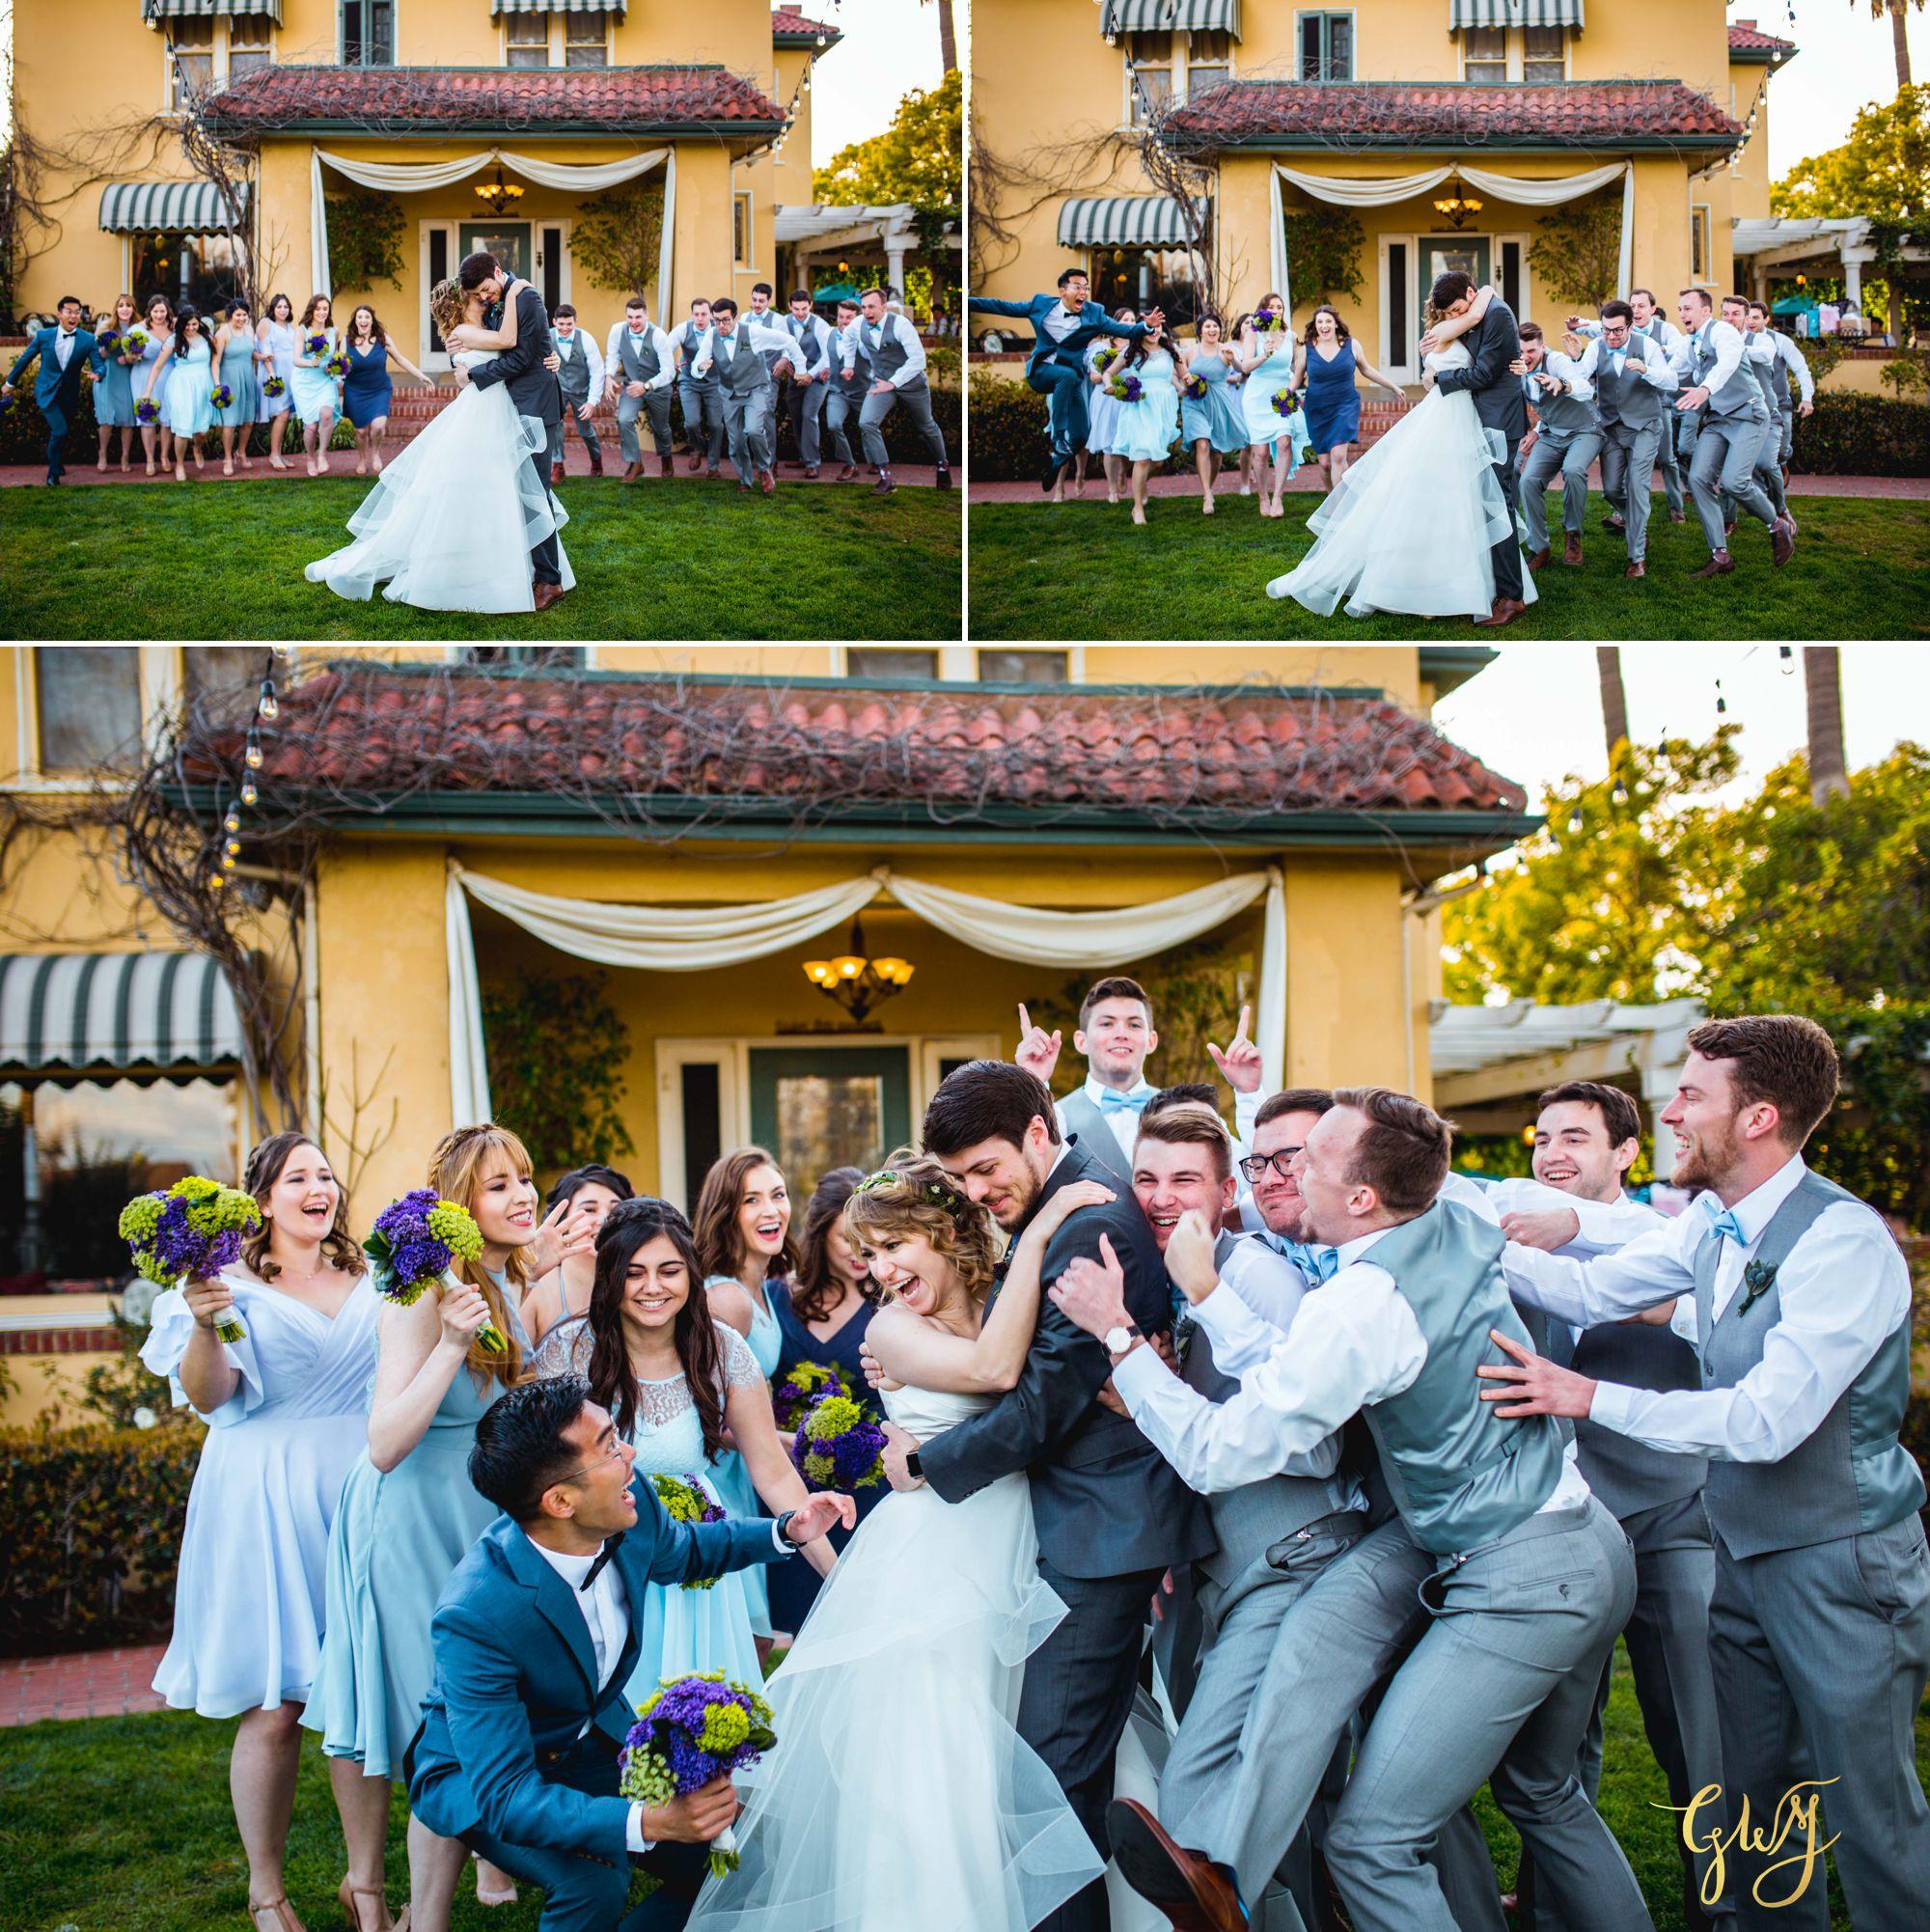 Garrett + Michelle's French Estate Orange County Spring Wedding by Glass Woods Media 32.jpg